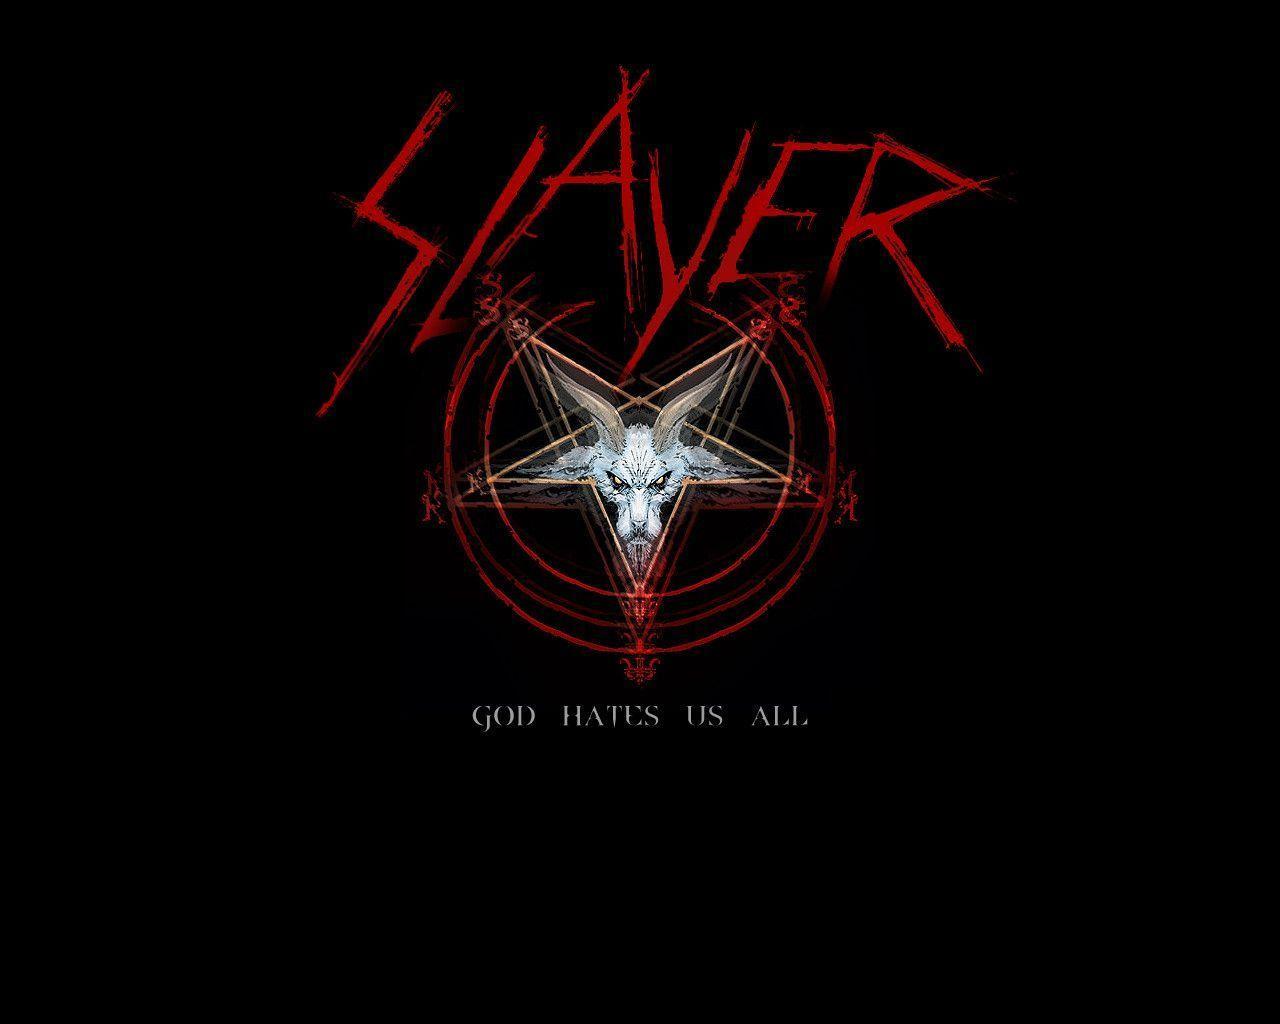 Slayer Band Wallpapers 1280x1024